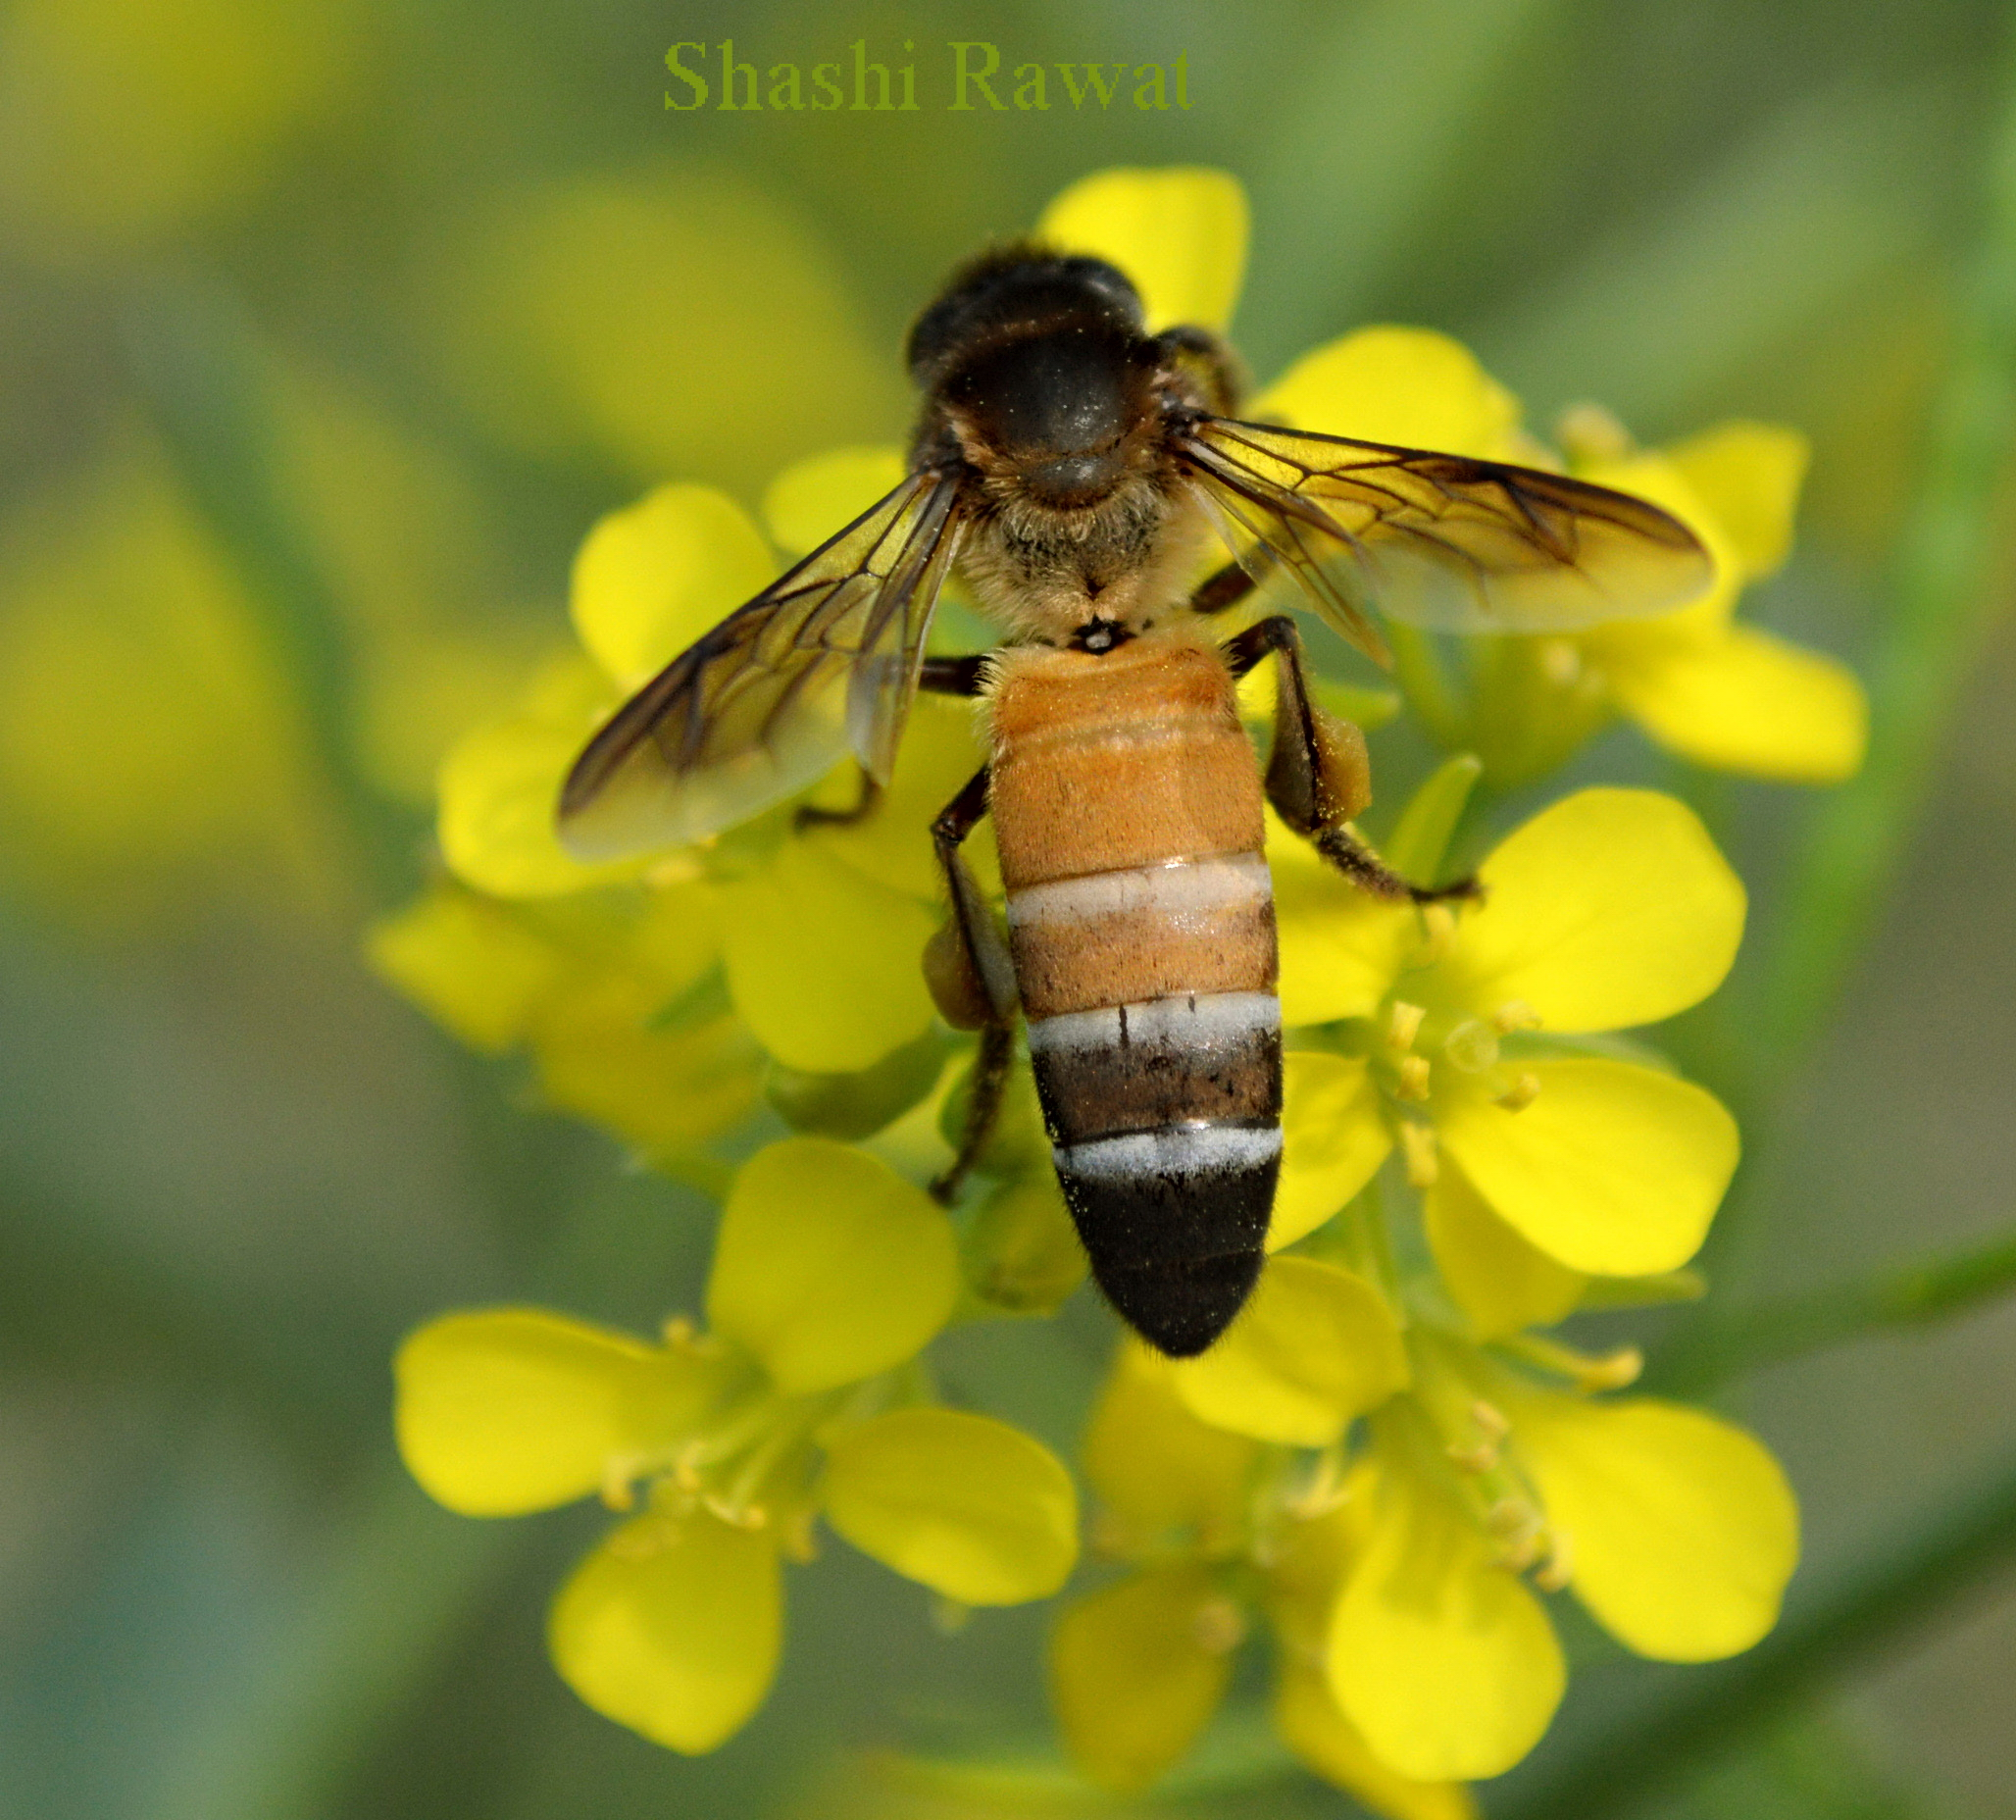 Honey Bee on Yellow Flower. Copyright image by Shashi Rawat